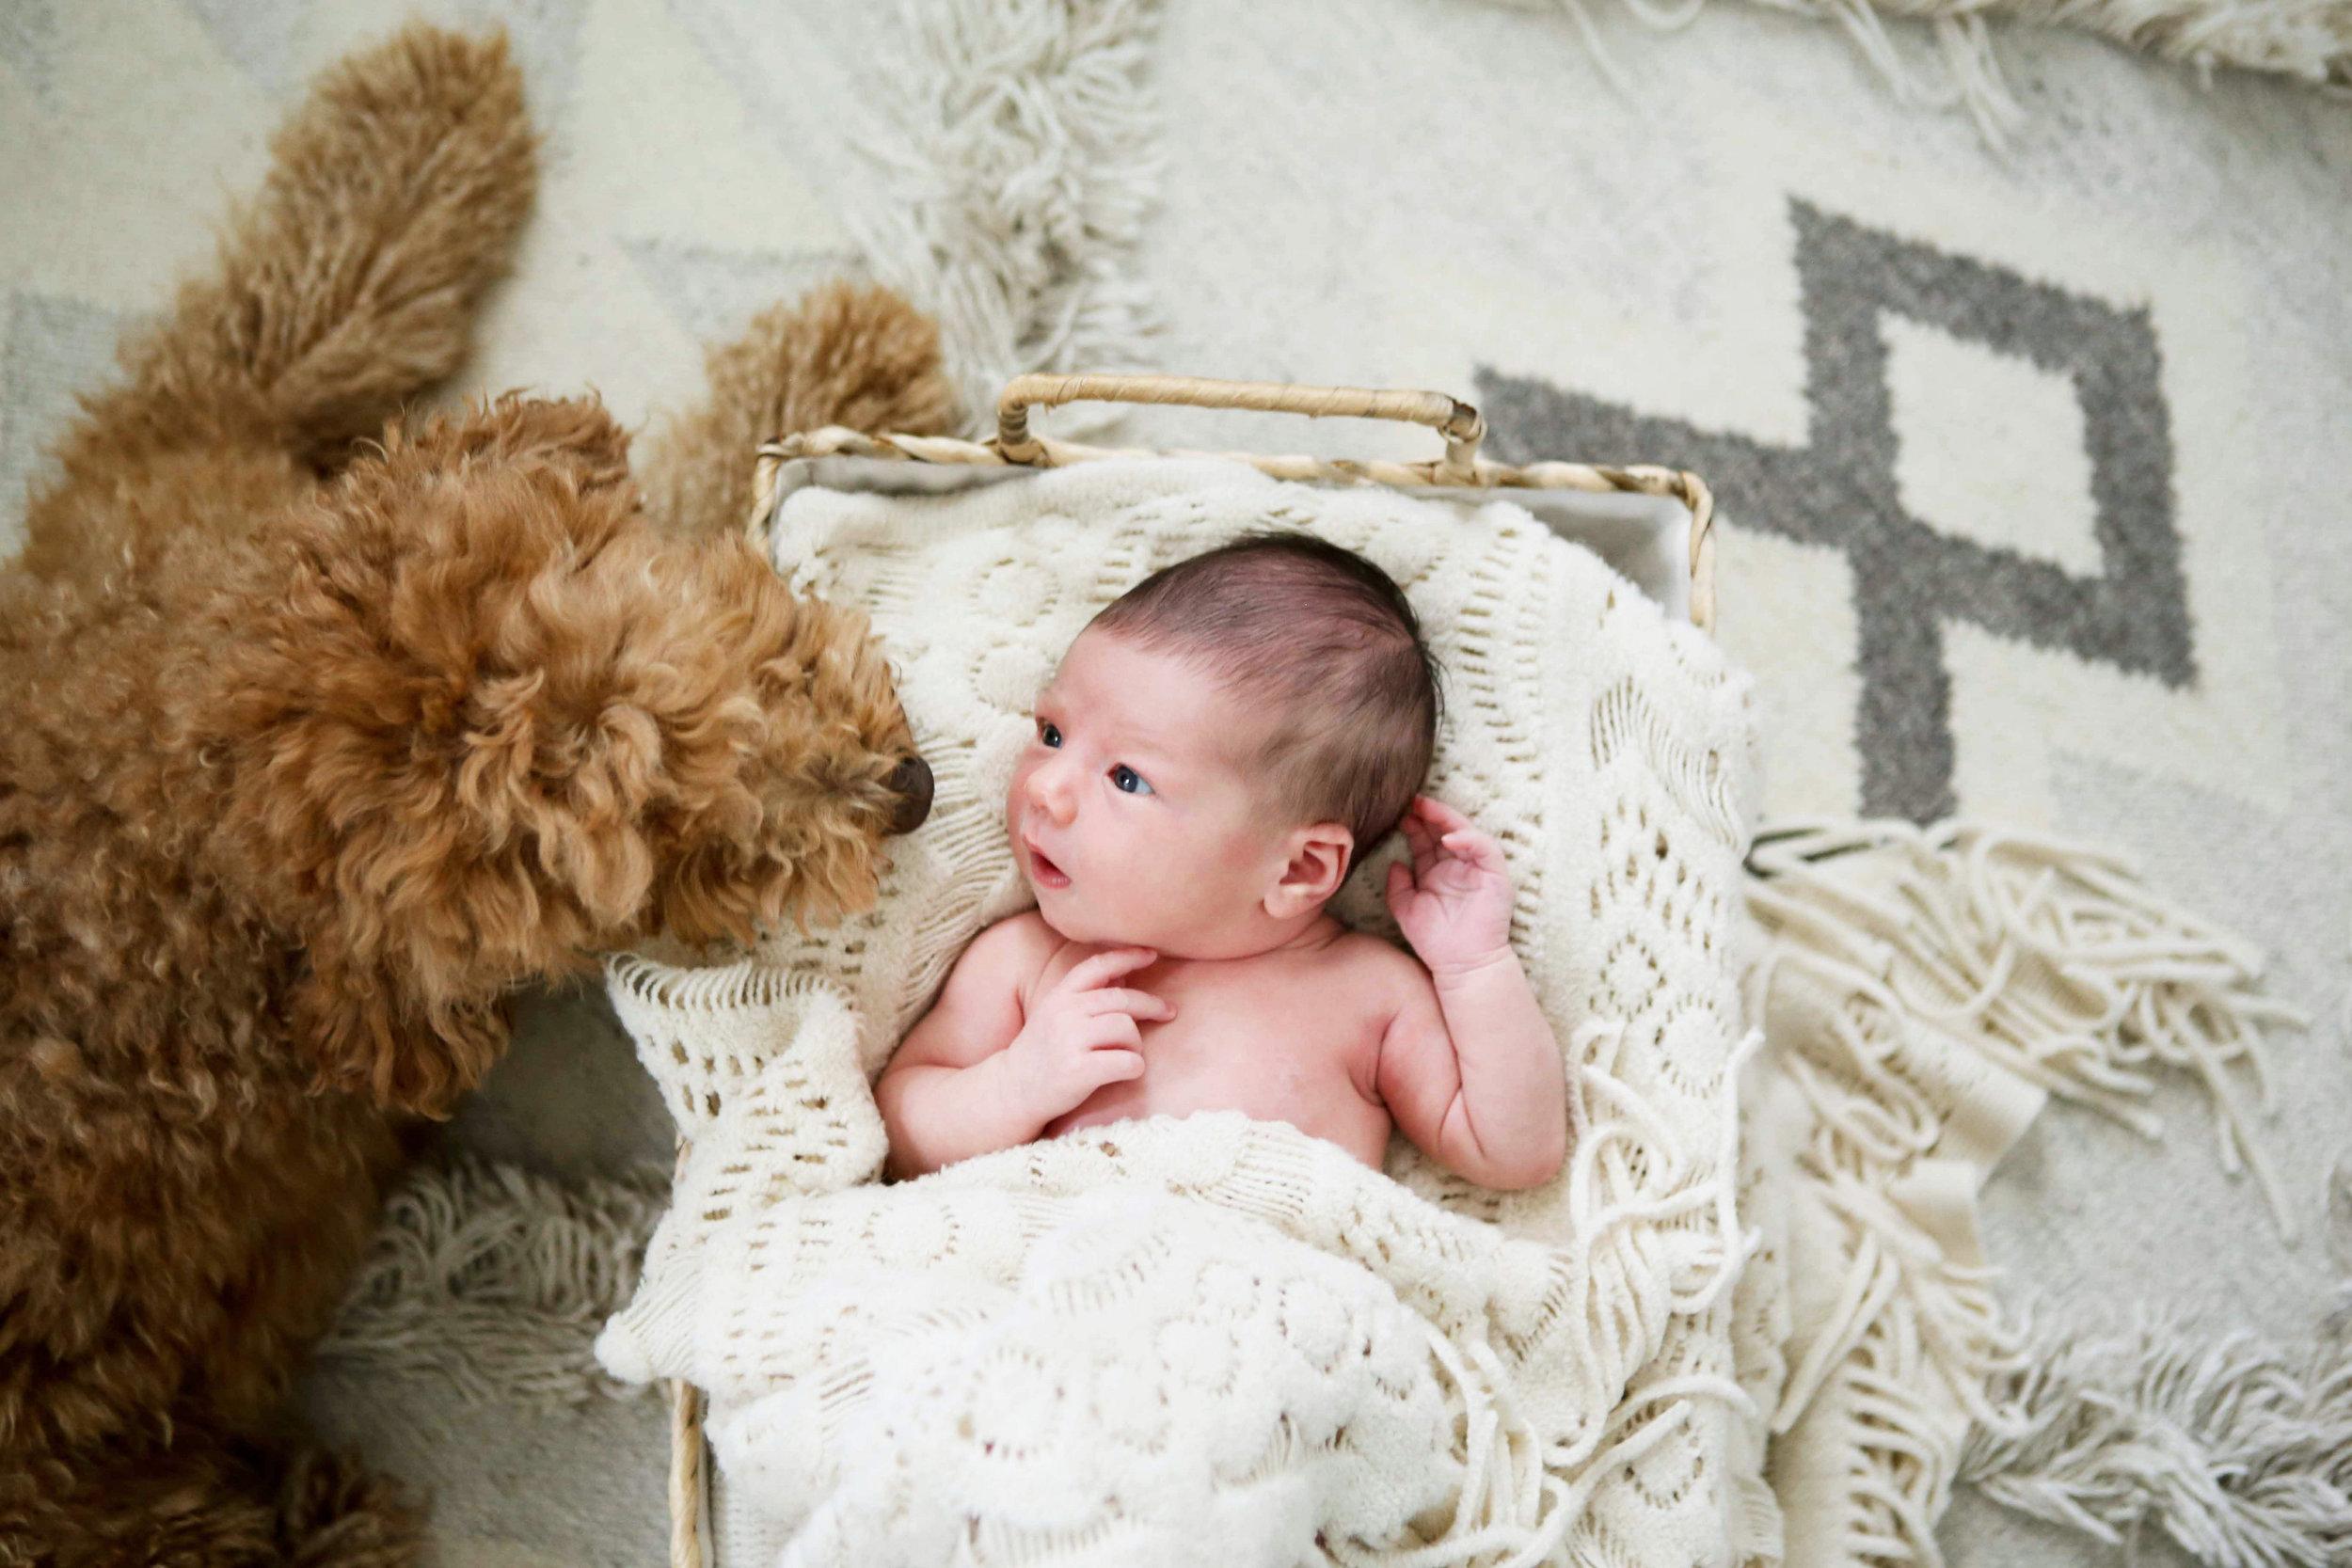 Baby Charlie-Charlie Harper-0026.jpg